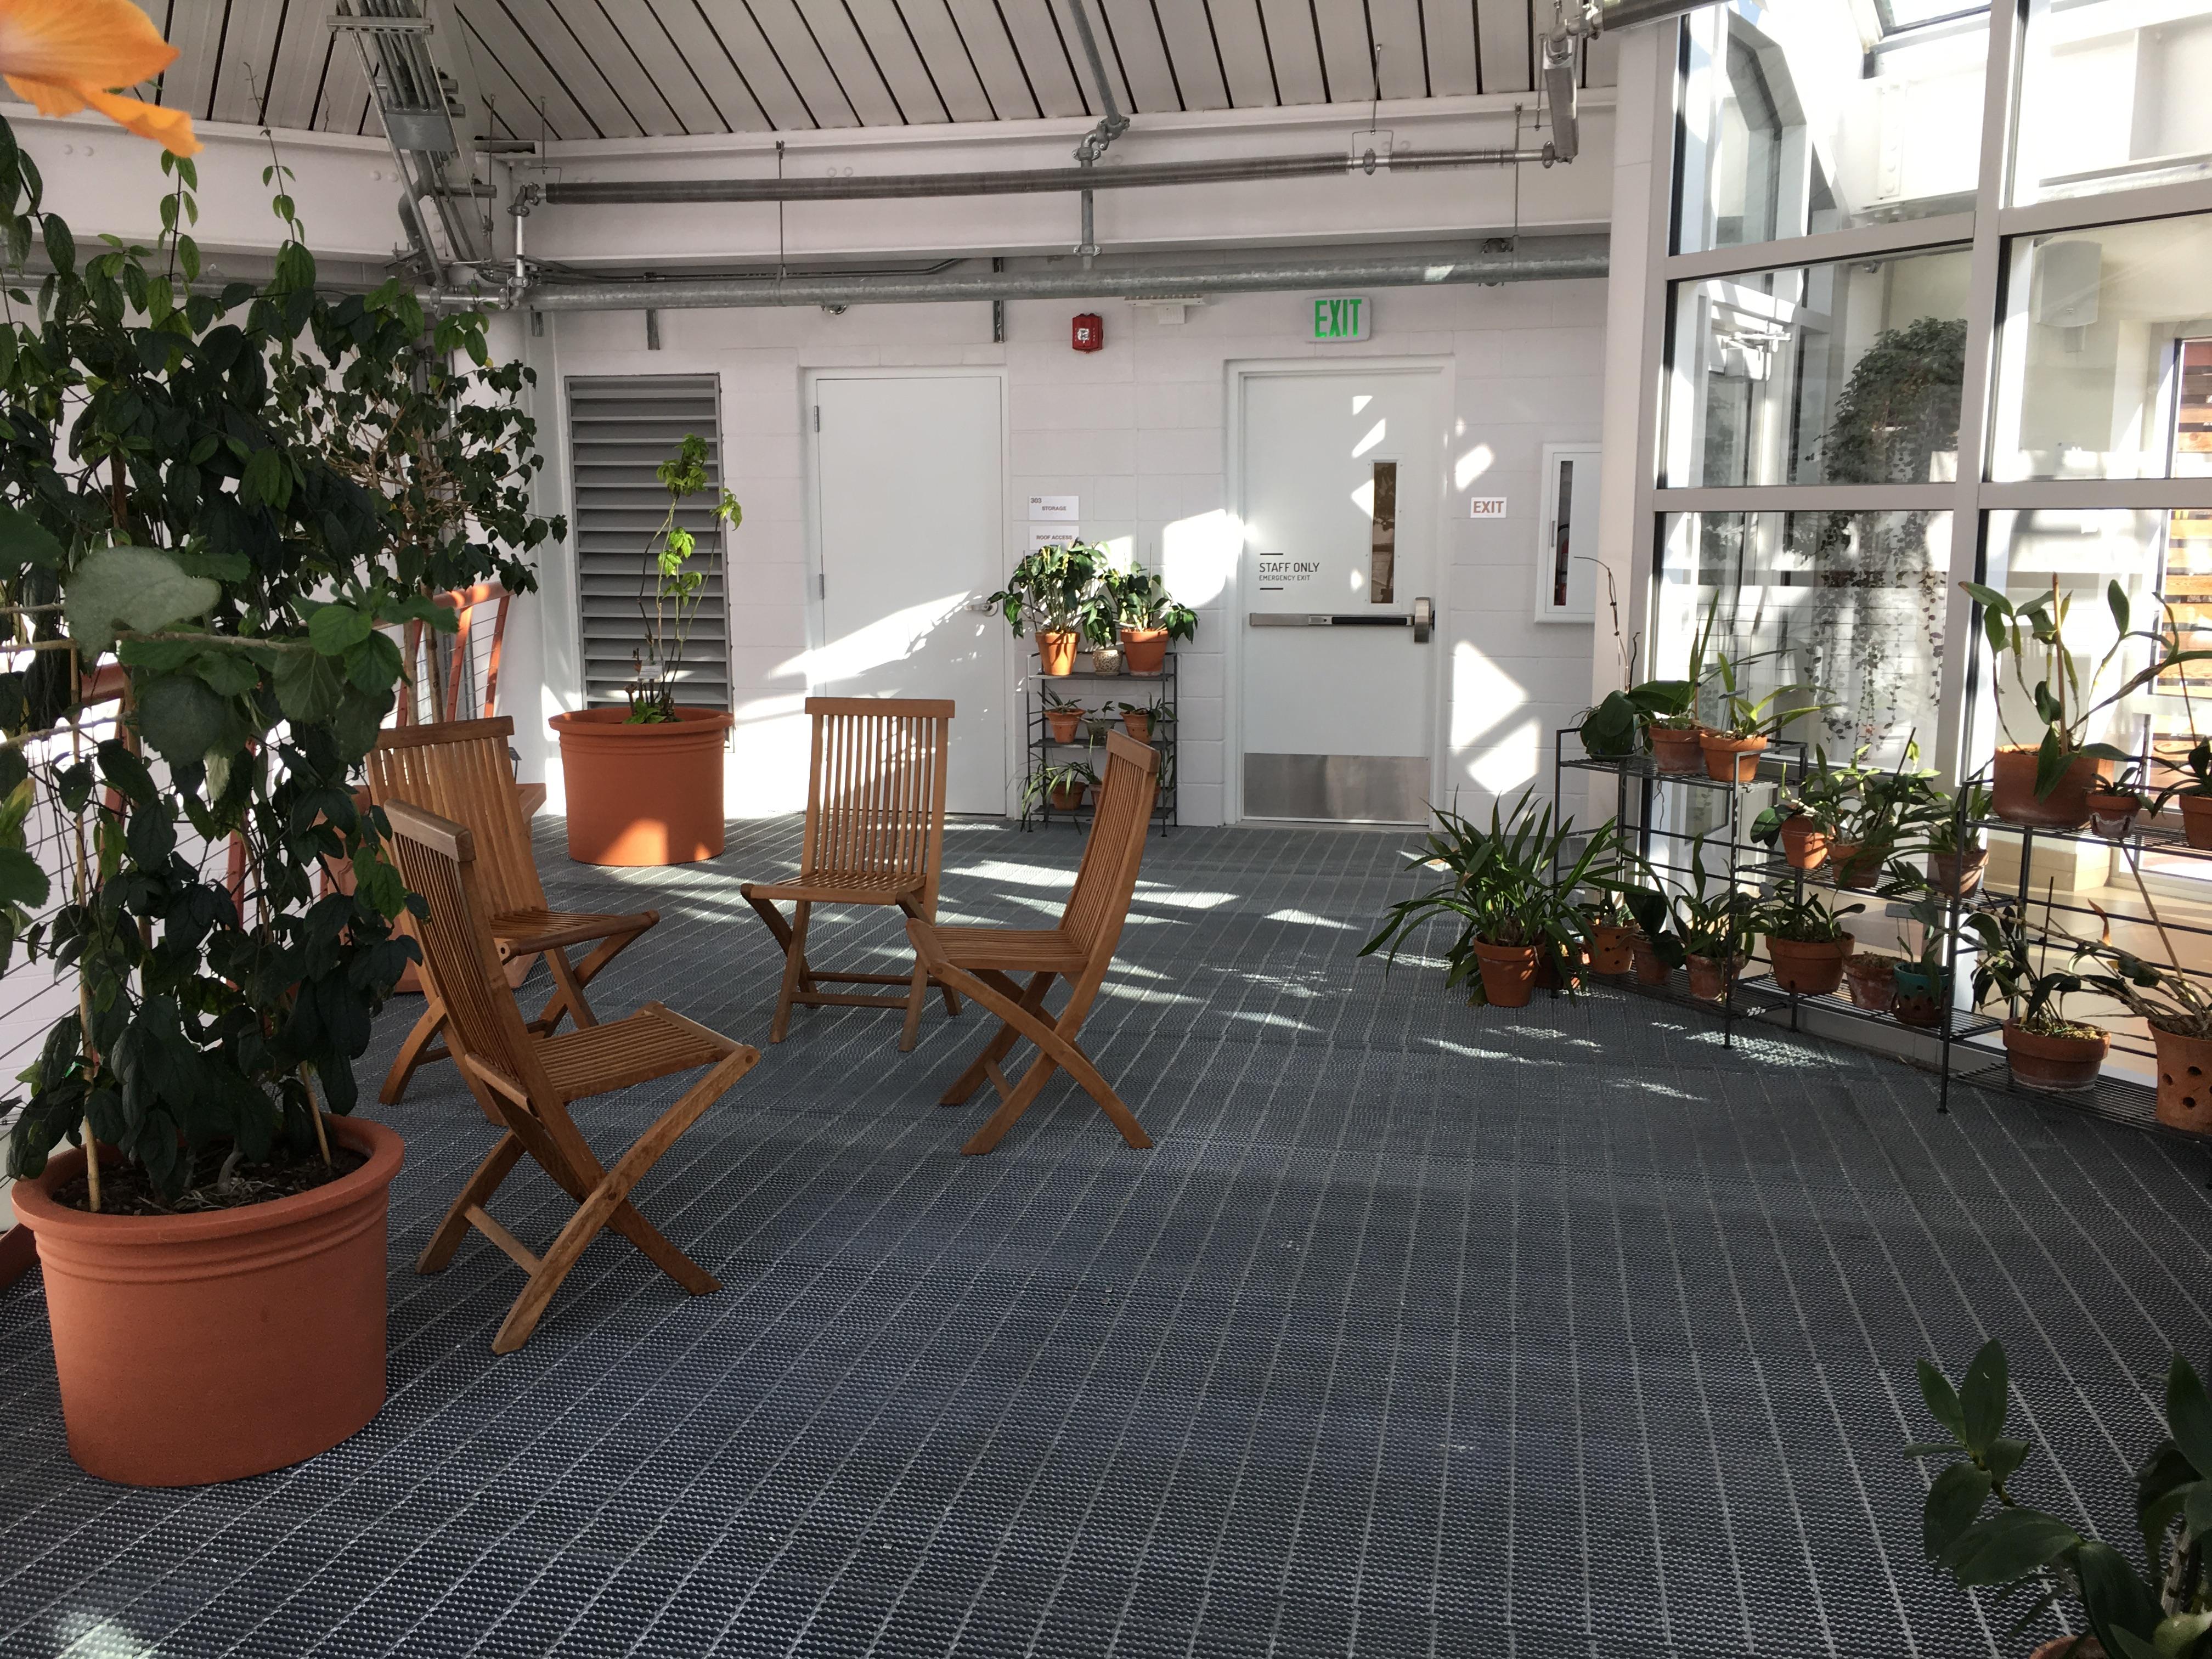 2019-01-26 cbg conservatory 20